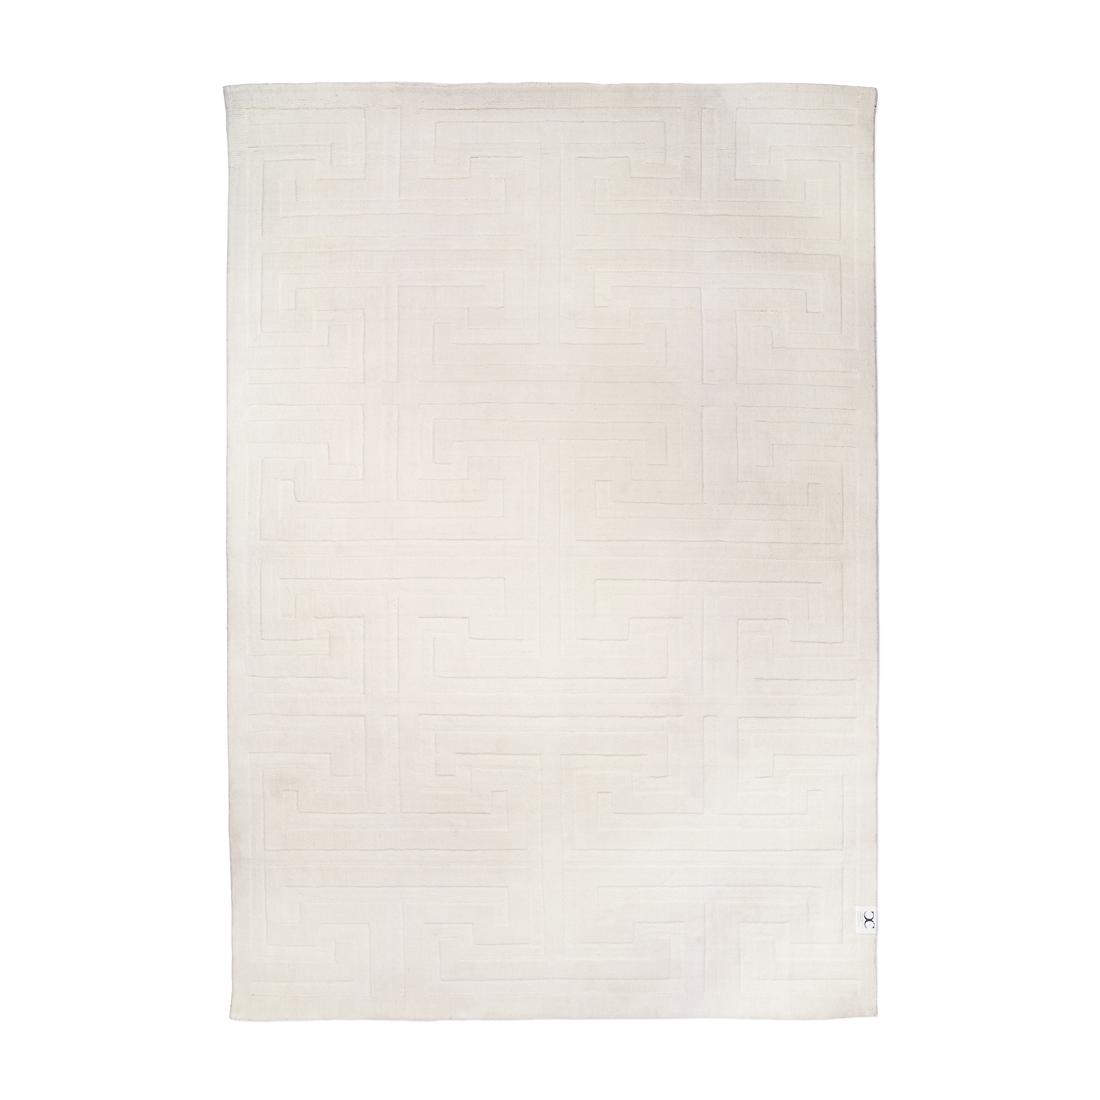 Vit ullmatta KEY WOOL 200 x 300 cm, Classic Collection